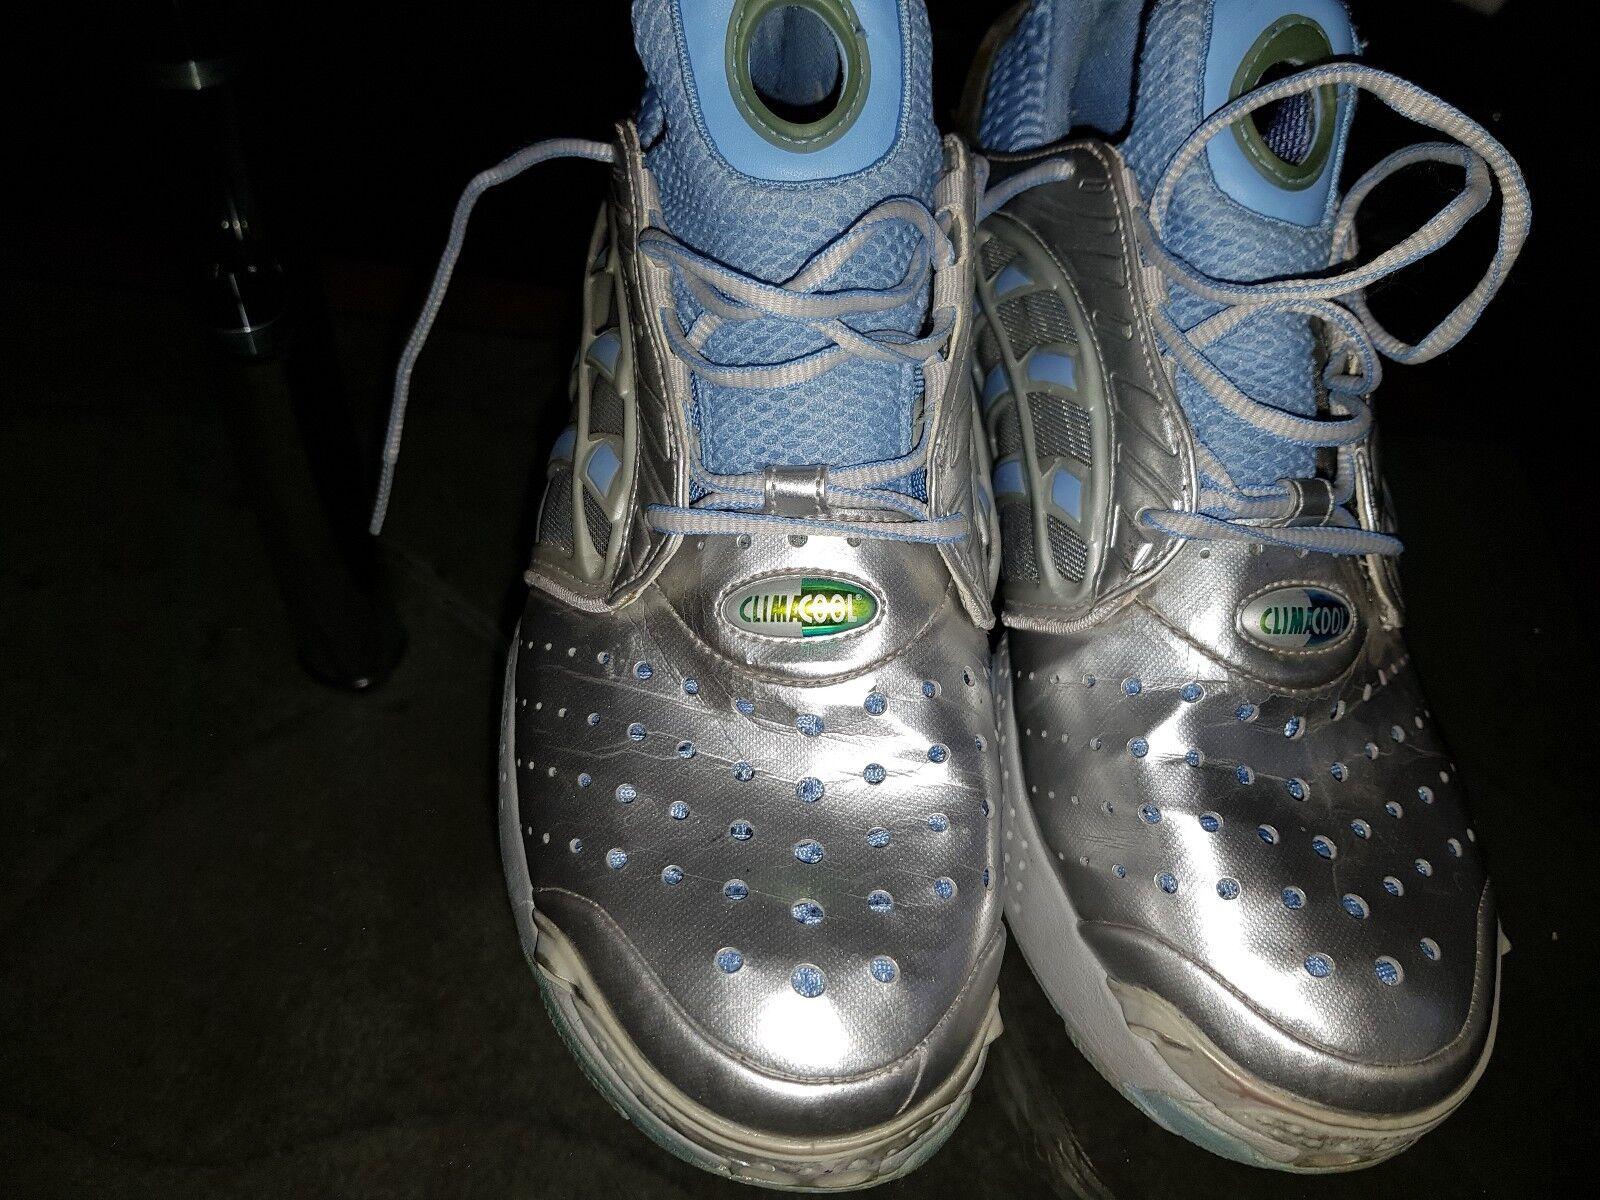 Adidas climacool old school 2002